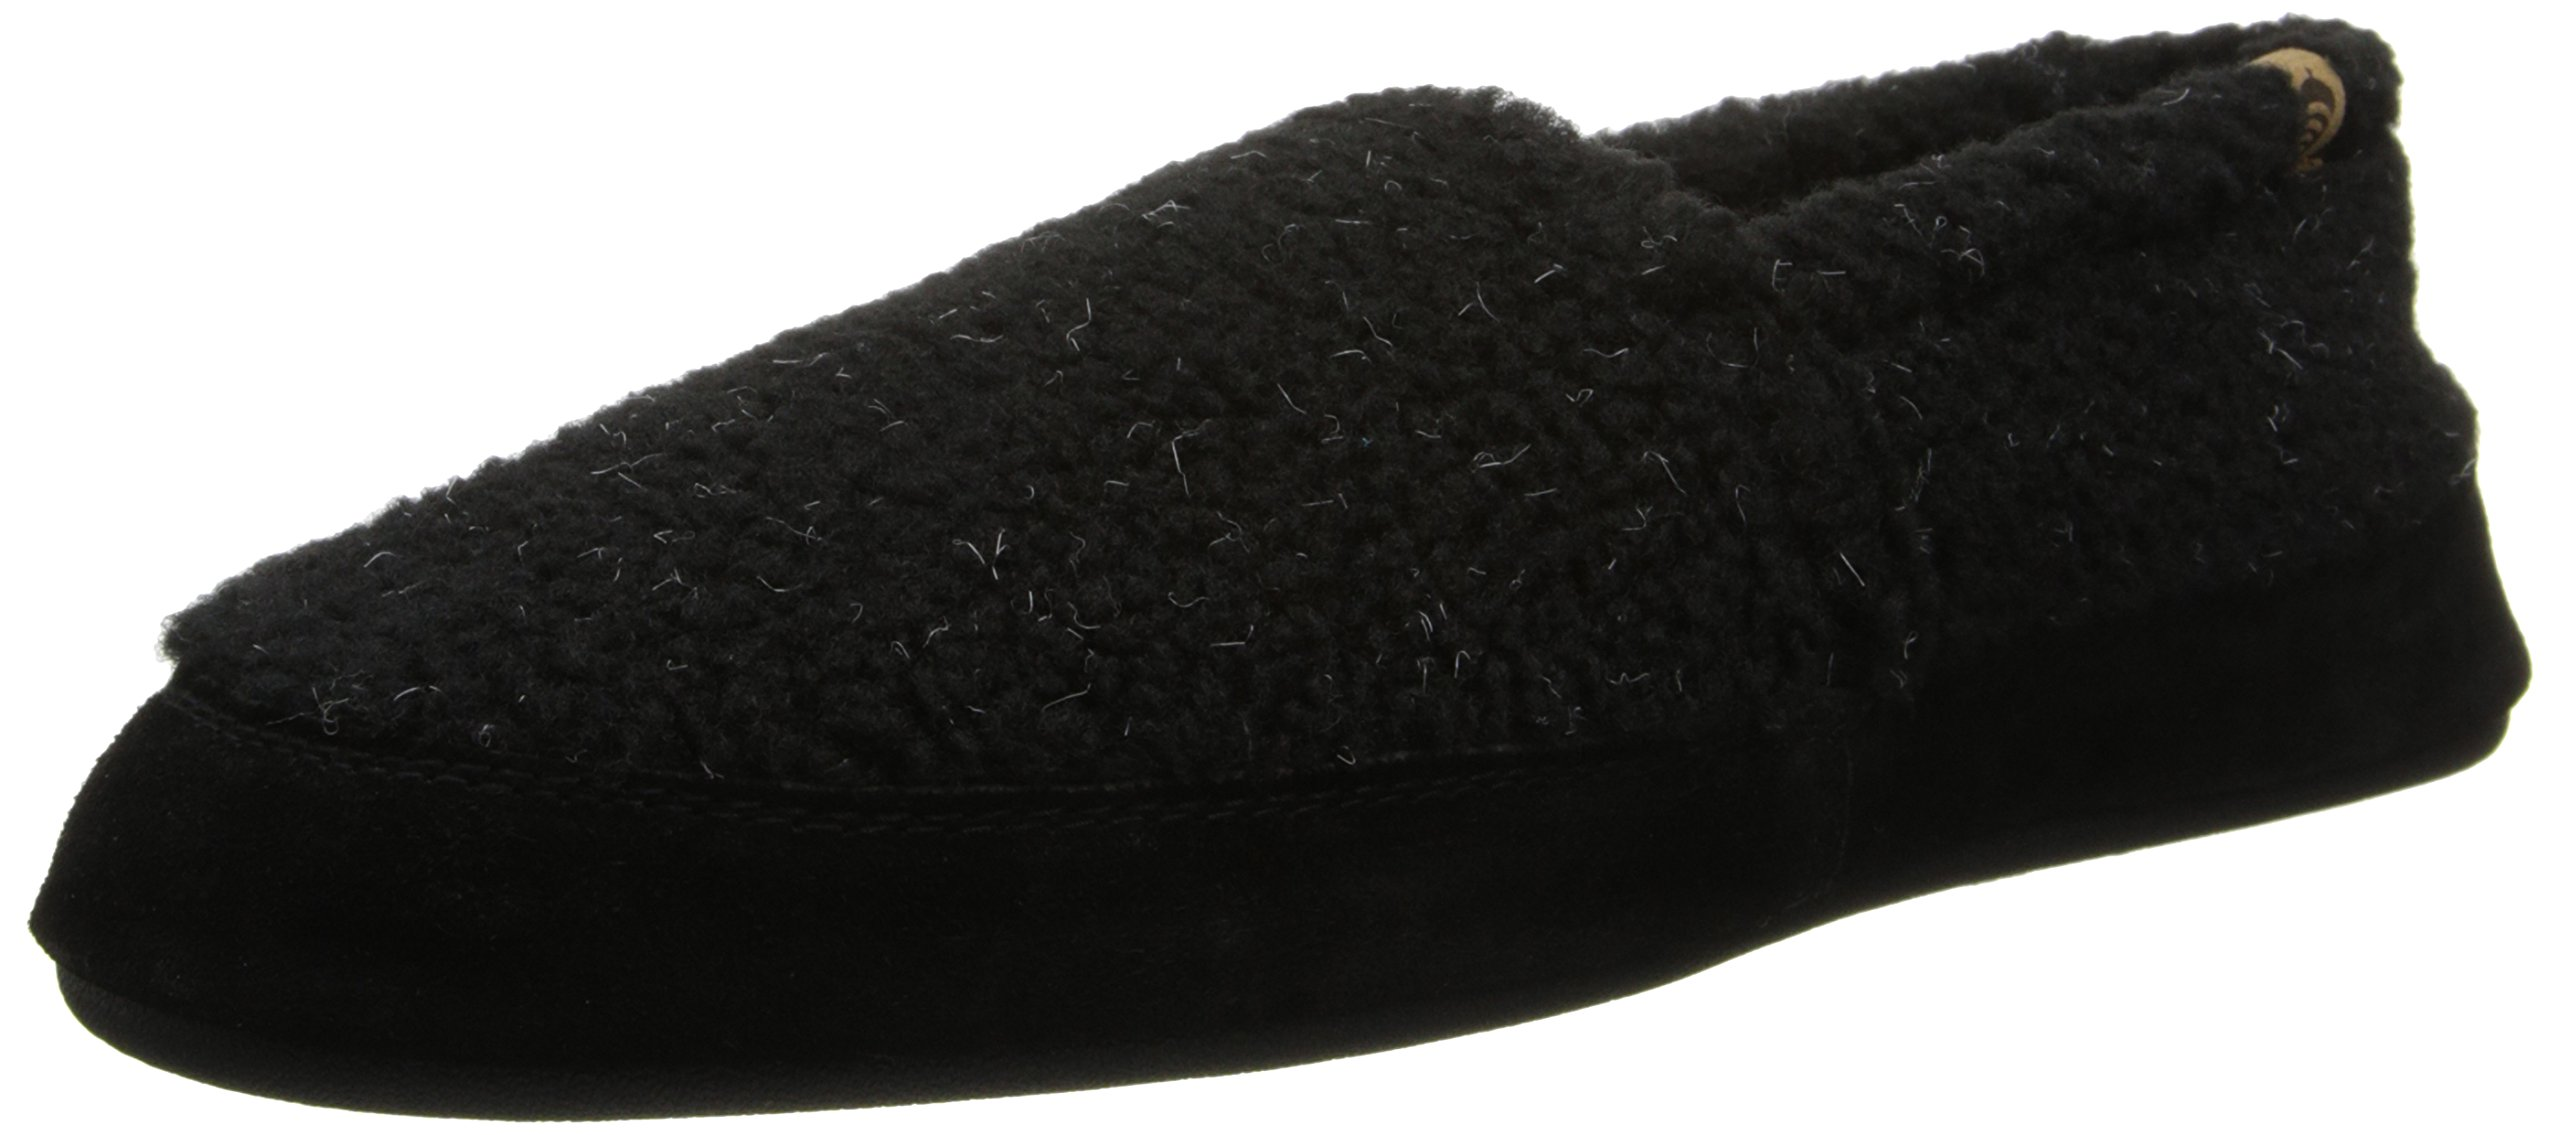 Acorn Men's Moc Slip-On Loafer, Black Berber, XX-Large/14-15 M US